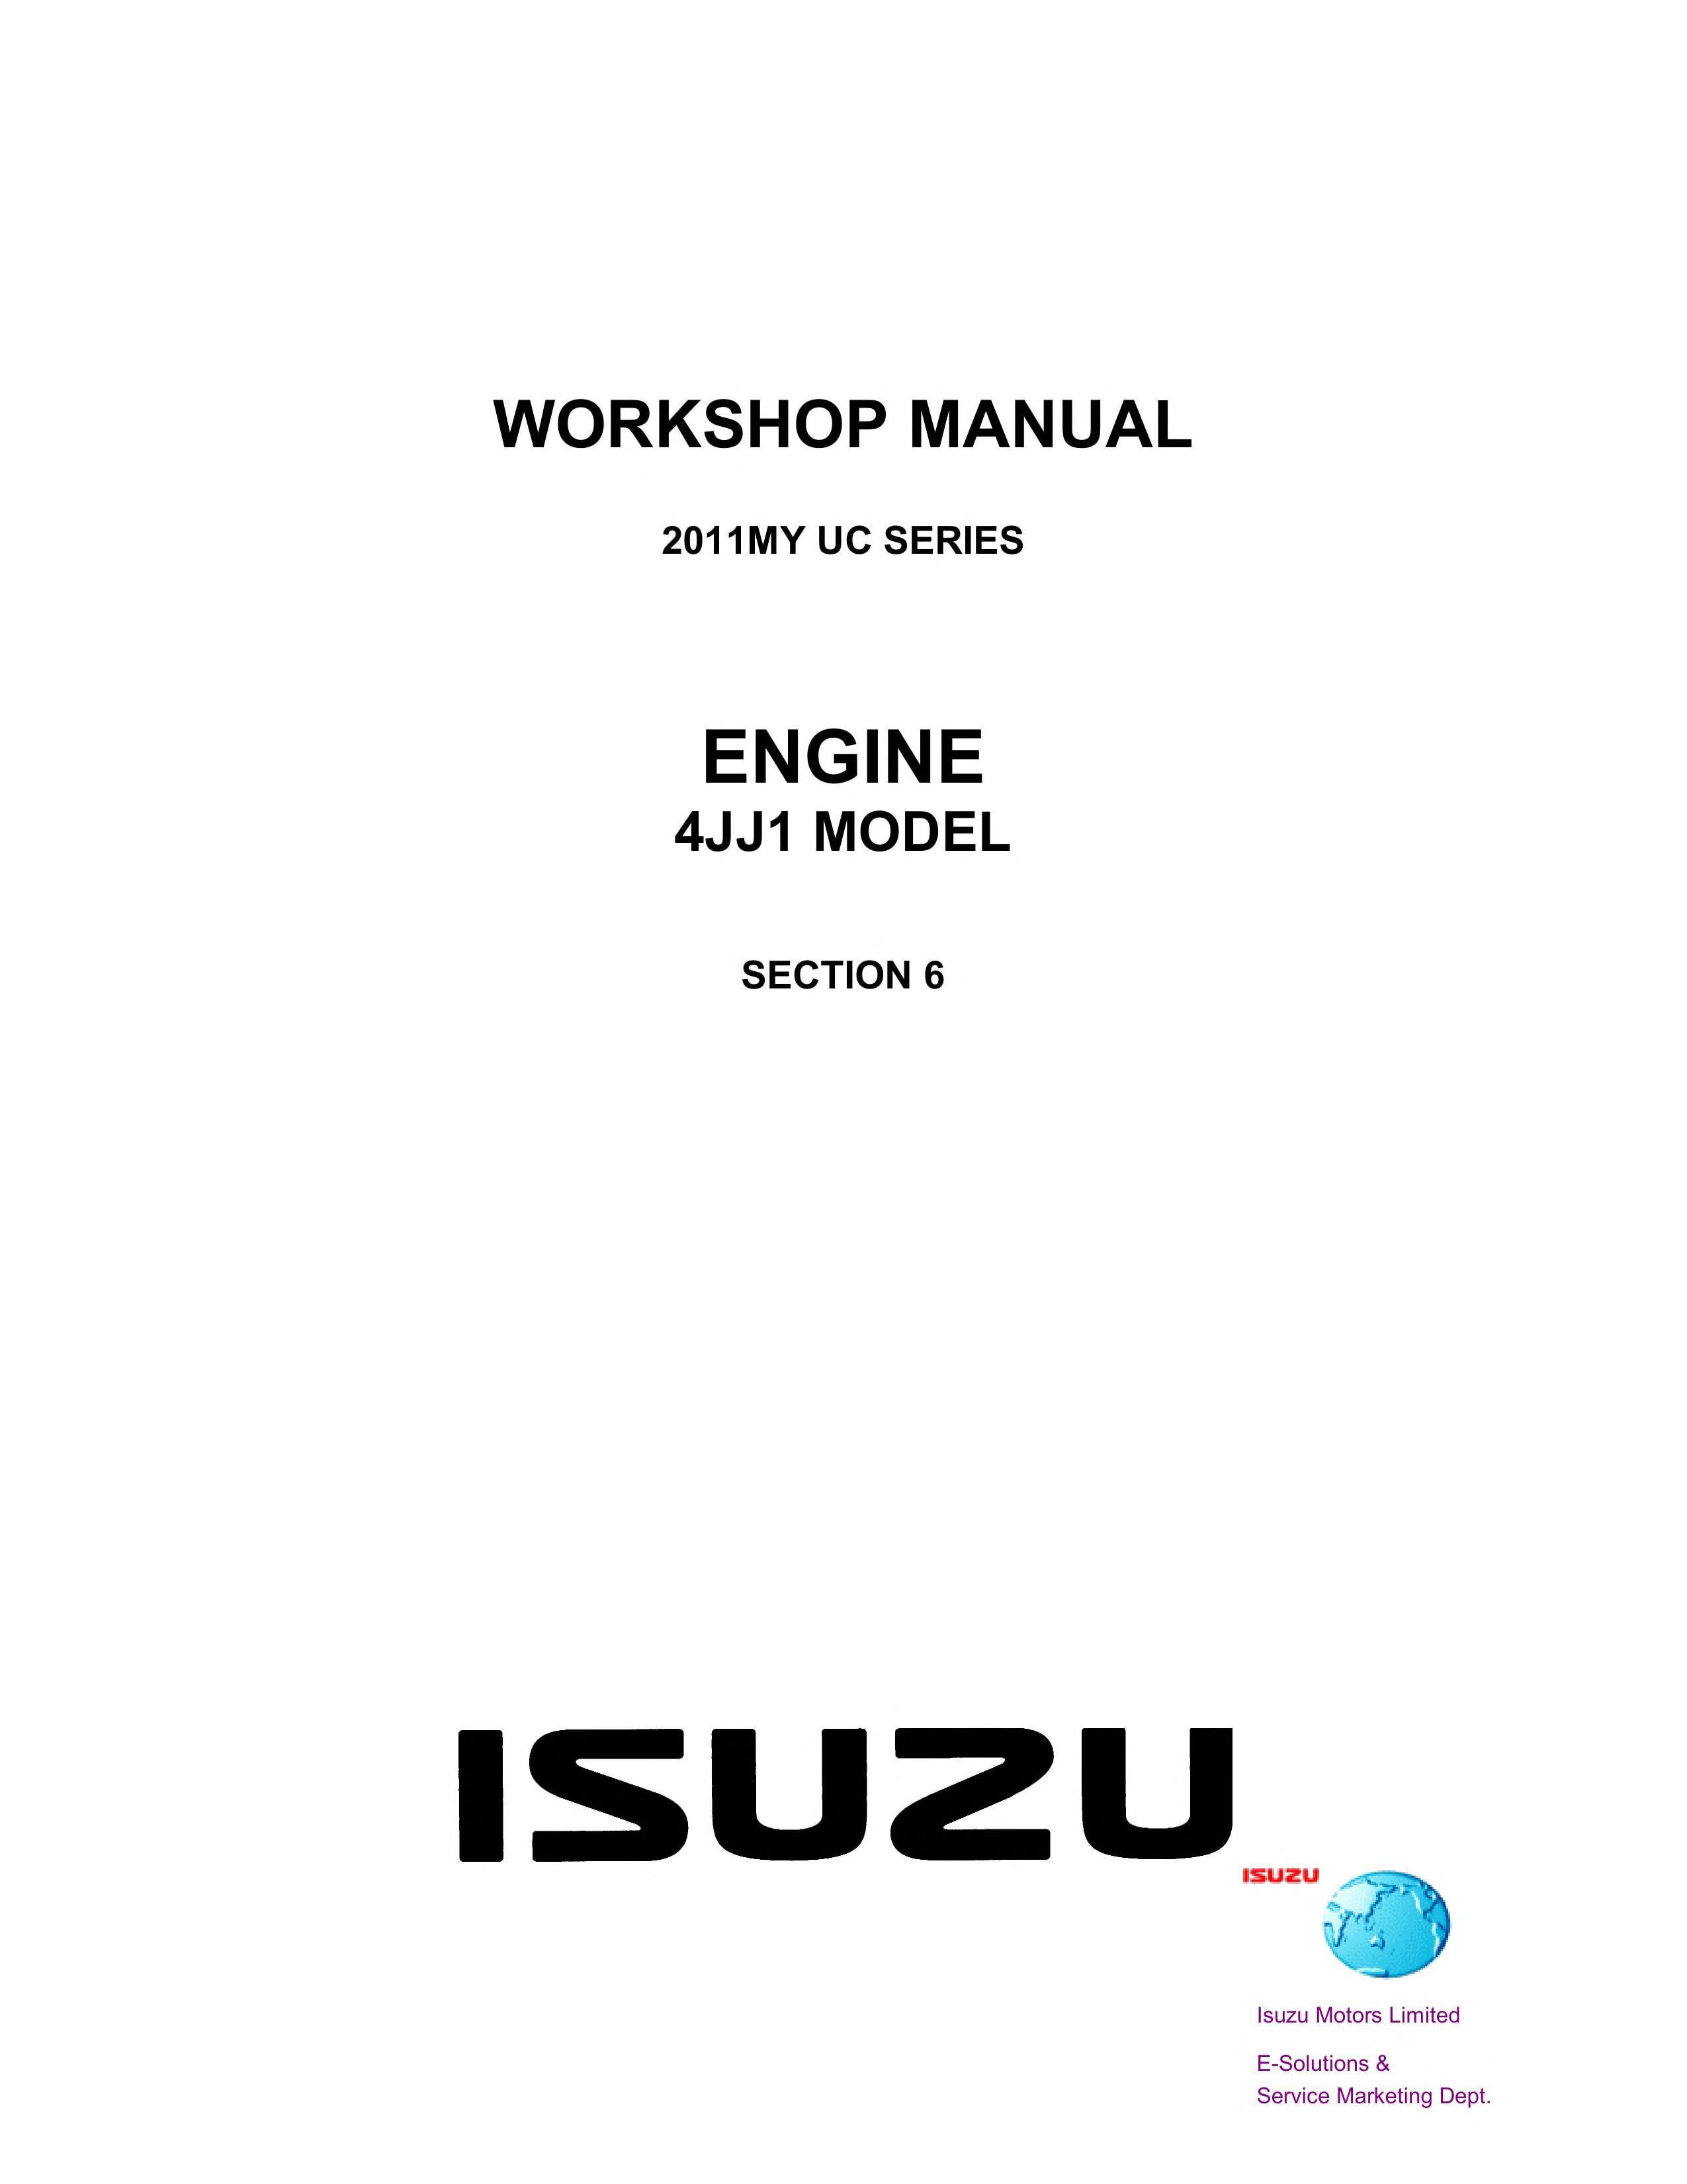 isuzu d max 2011 4jj1 engine service manual pdf pdfy mirror free download borrow and streaming internet archive [ 2550 x 3301 Pixel ]